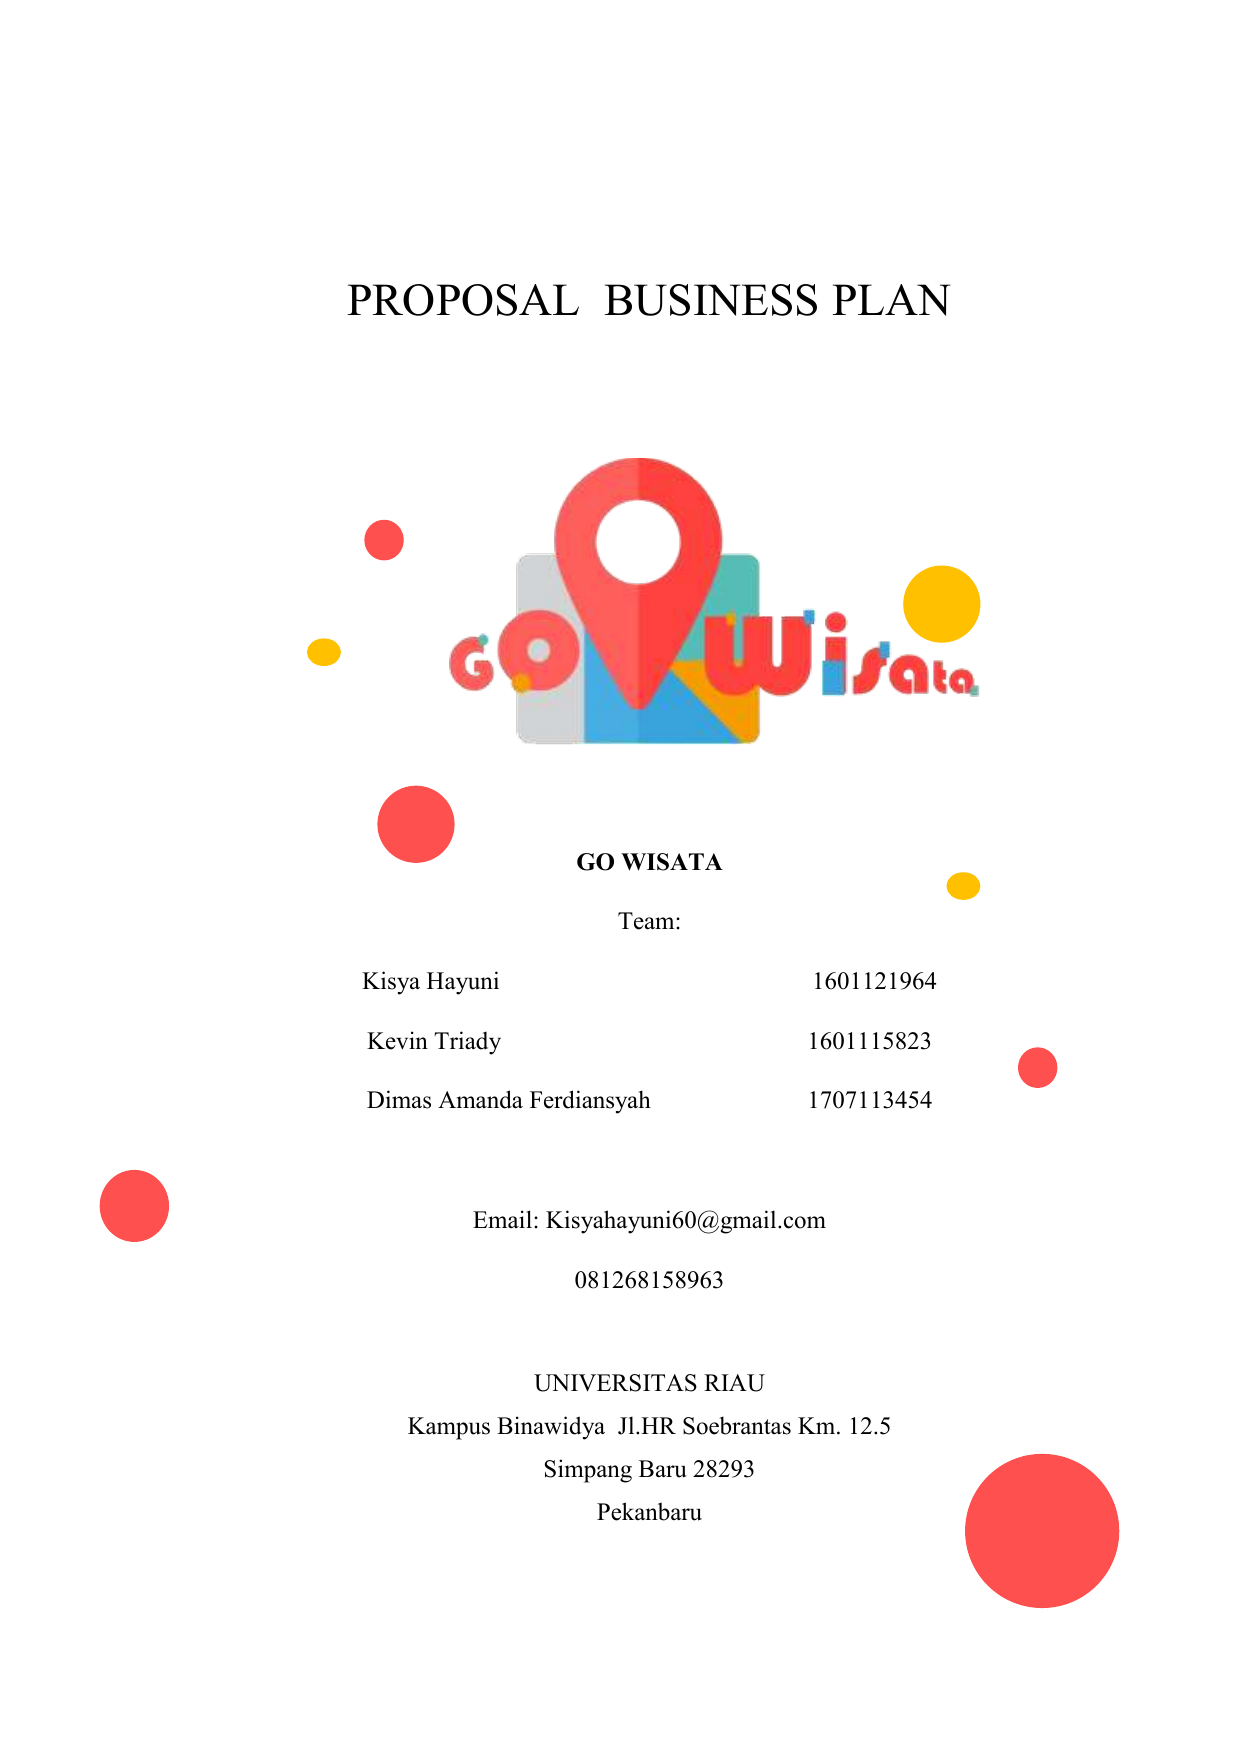 Proposal Business Plan Go Wisata Kkk